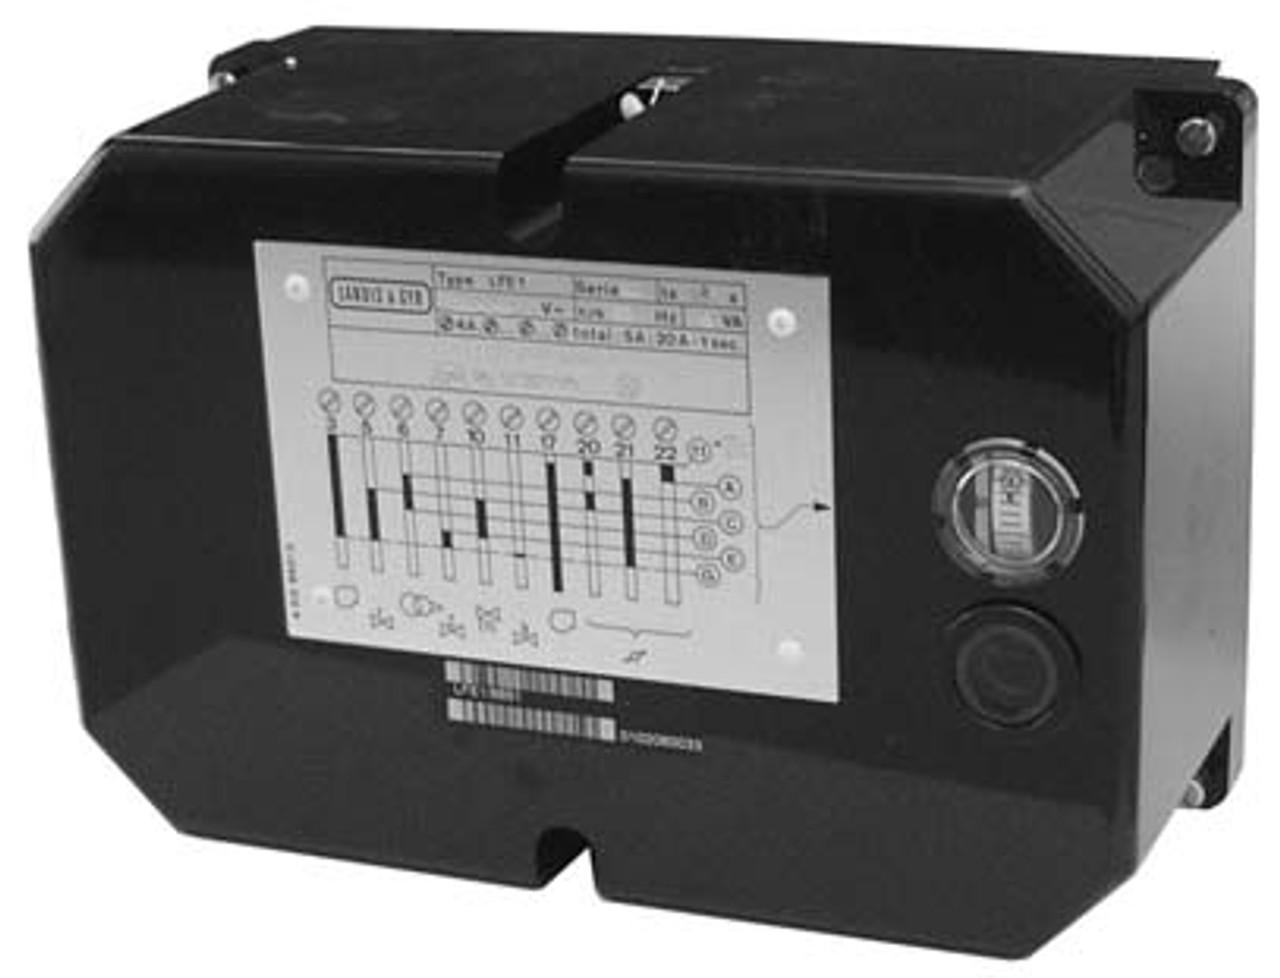 Siemens LFE1/8868 Oil/gas burner control, t1=30s, TSA=2s, t9=2s, AC100...110V/60Hz